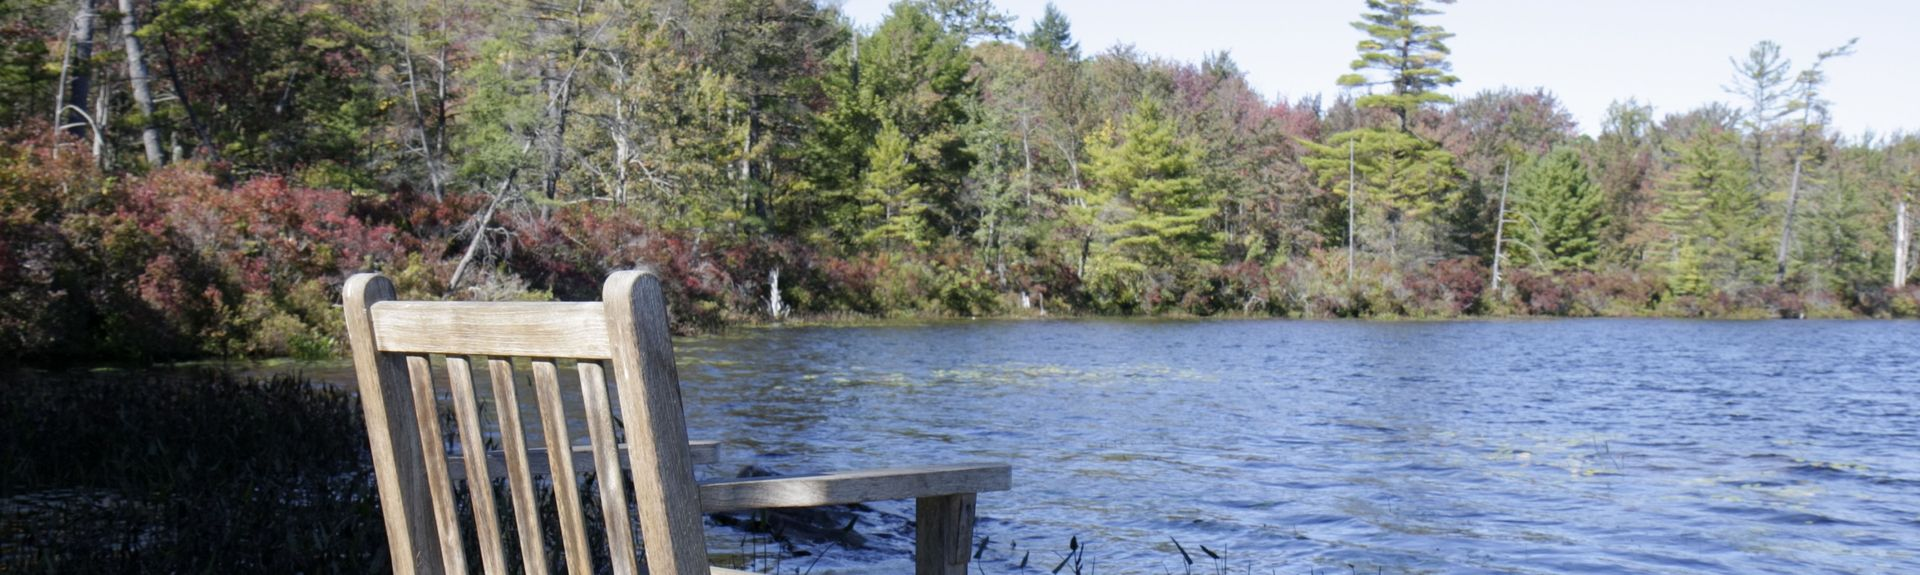 Lake Ariel, Pennsylvania, Verenigde Staten